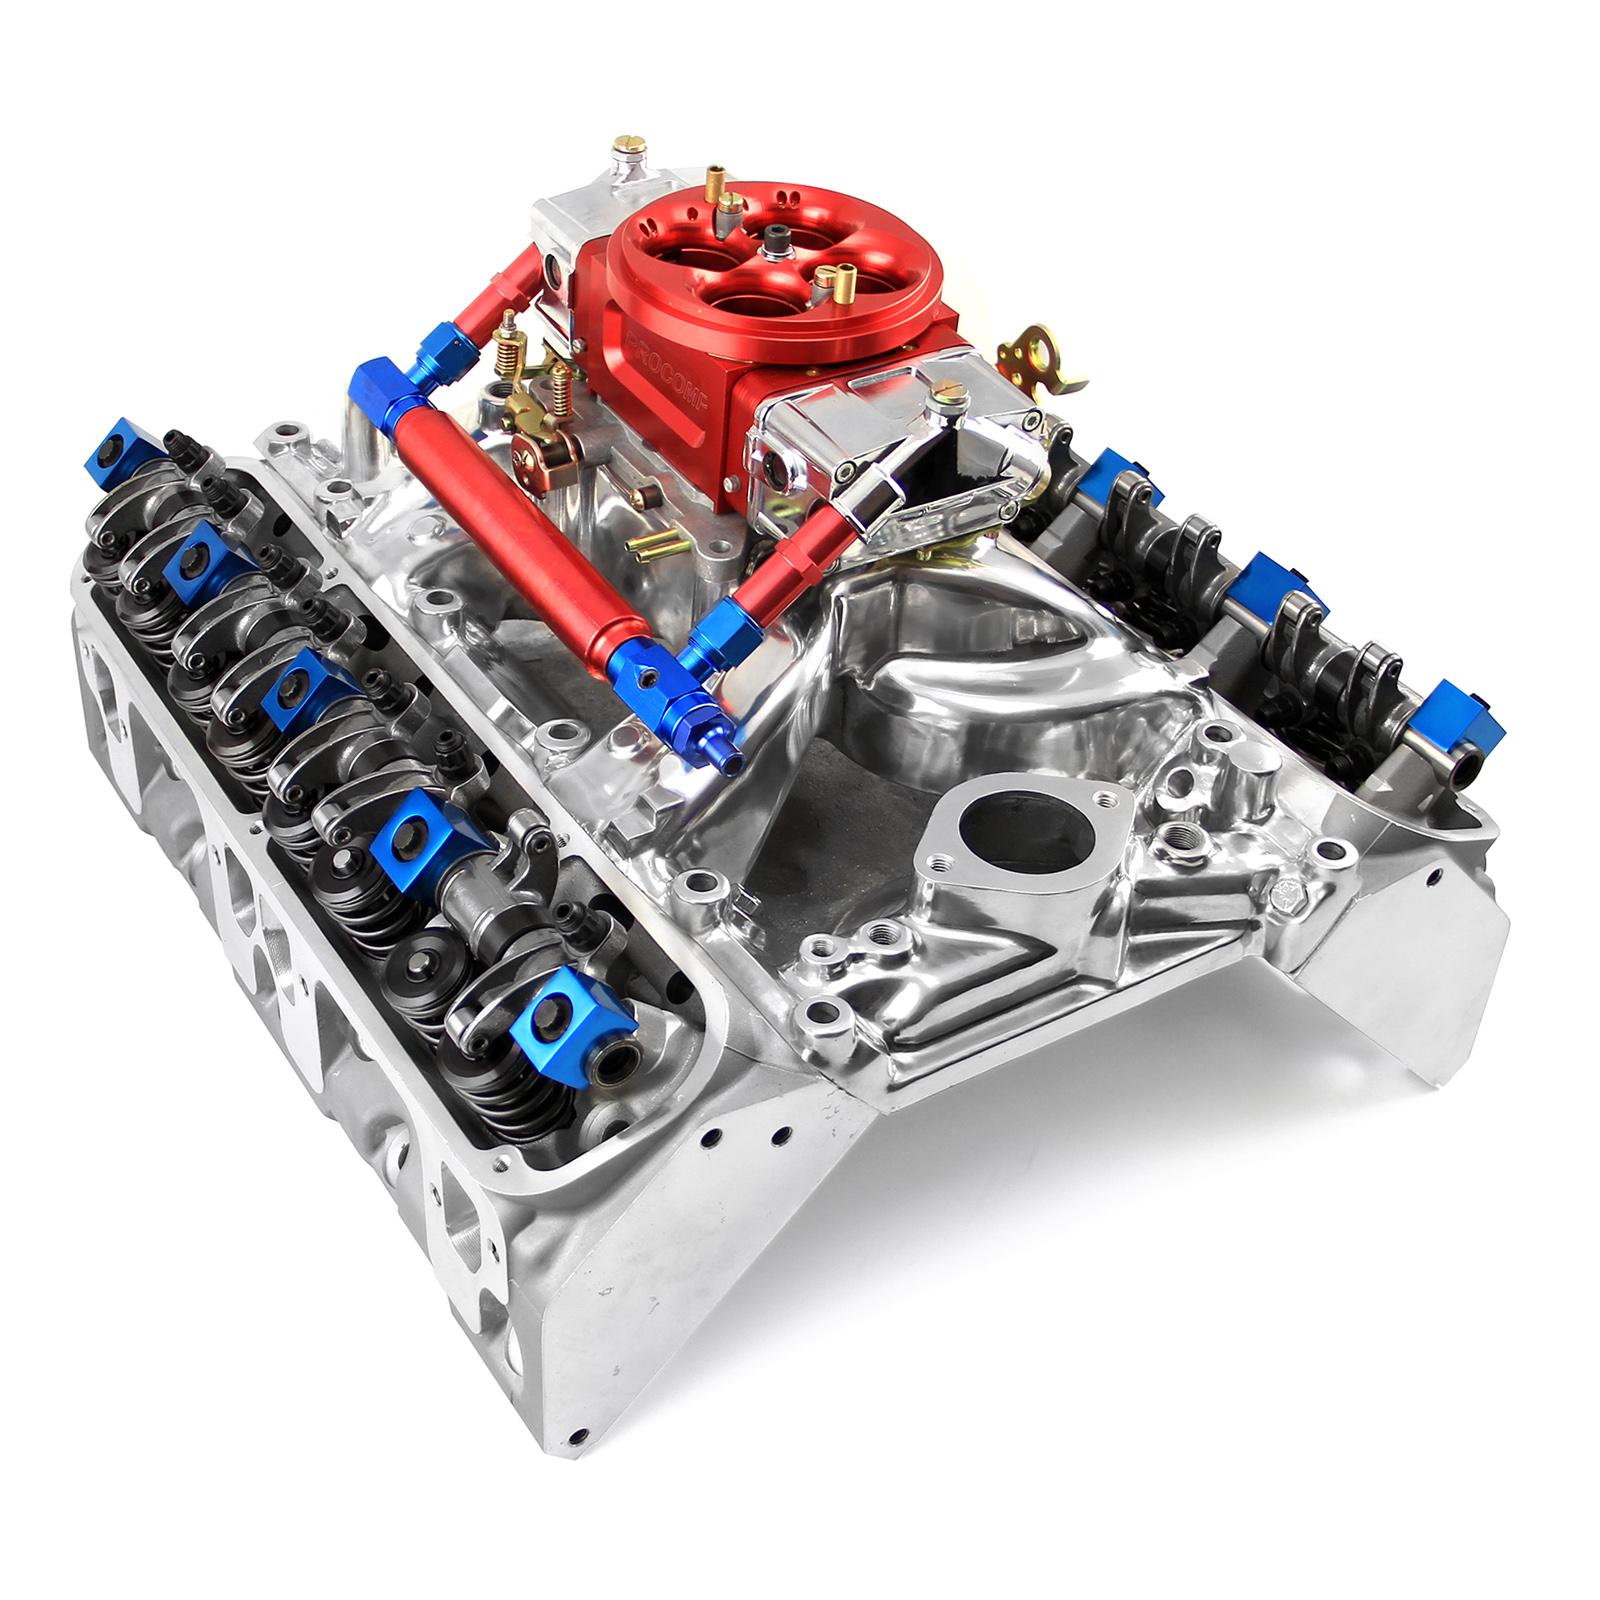 Mopar Engine Wiring Daily Update Diagram Chrysler 440 Electronic Ignition Dodge